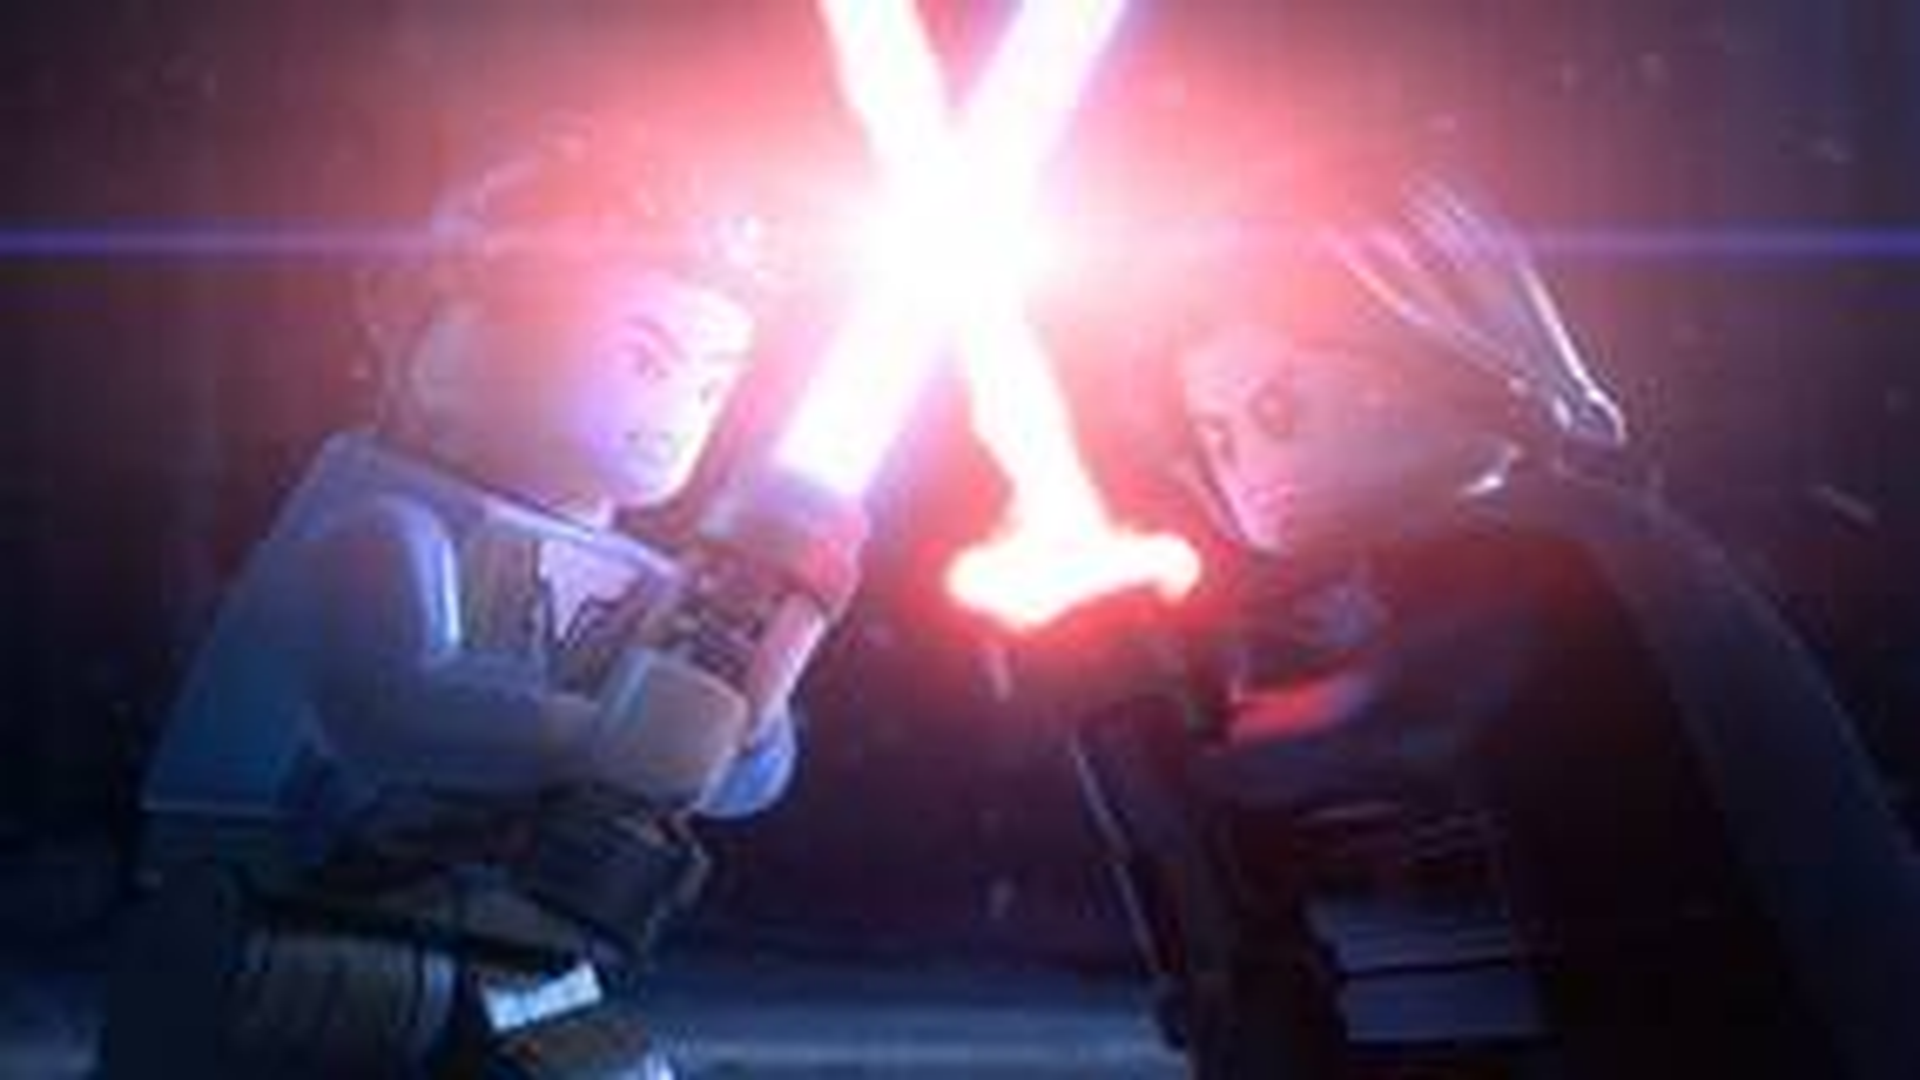 Image for LEGO Star Wars: The Skywalker Saga feels like a proper step forward for a stale series